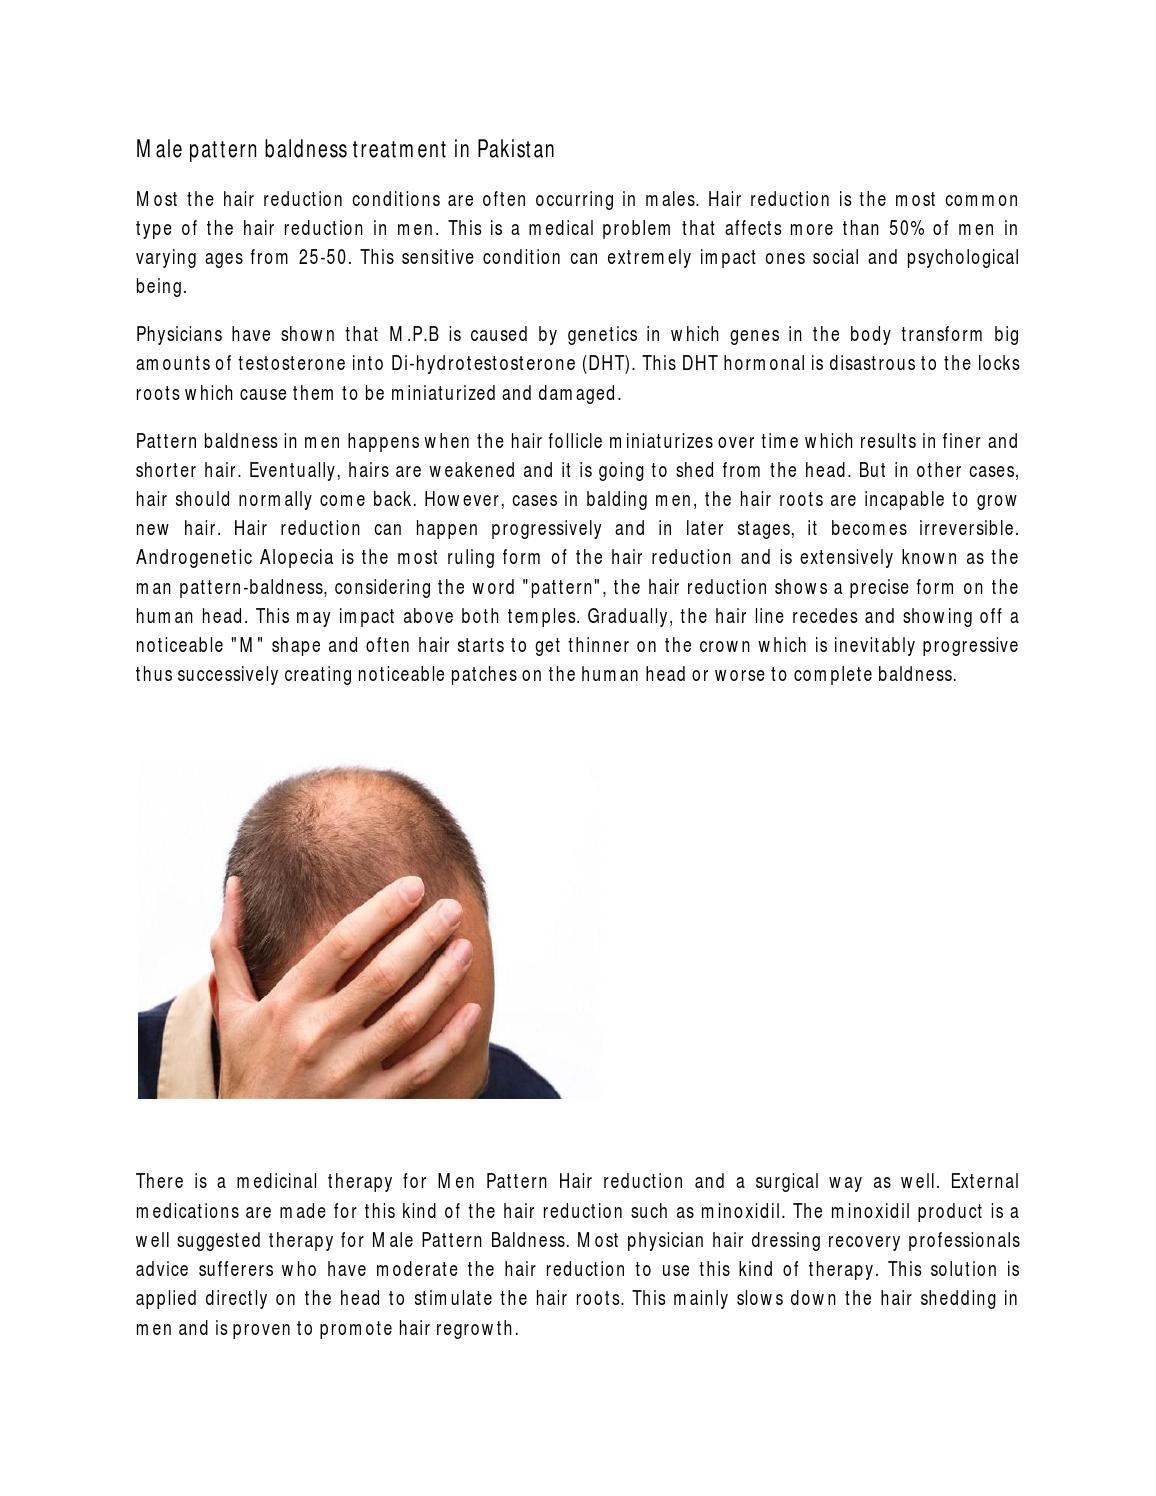 Male pattern baldness treatment in pakistan by maria - issuu